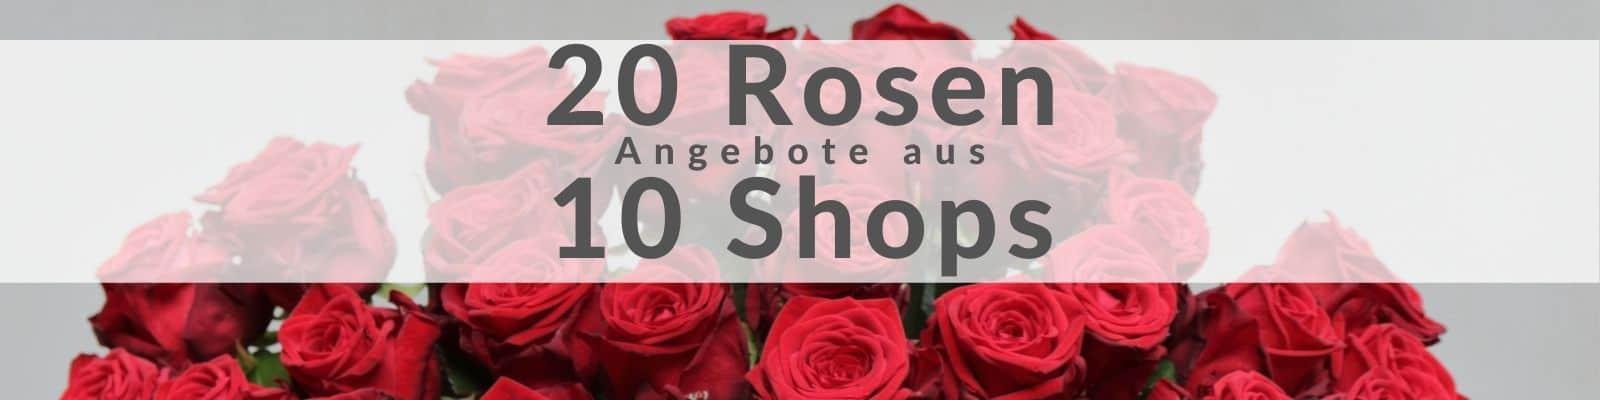 20 Rosen verschicken